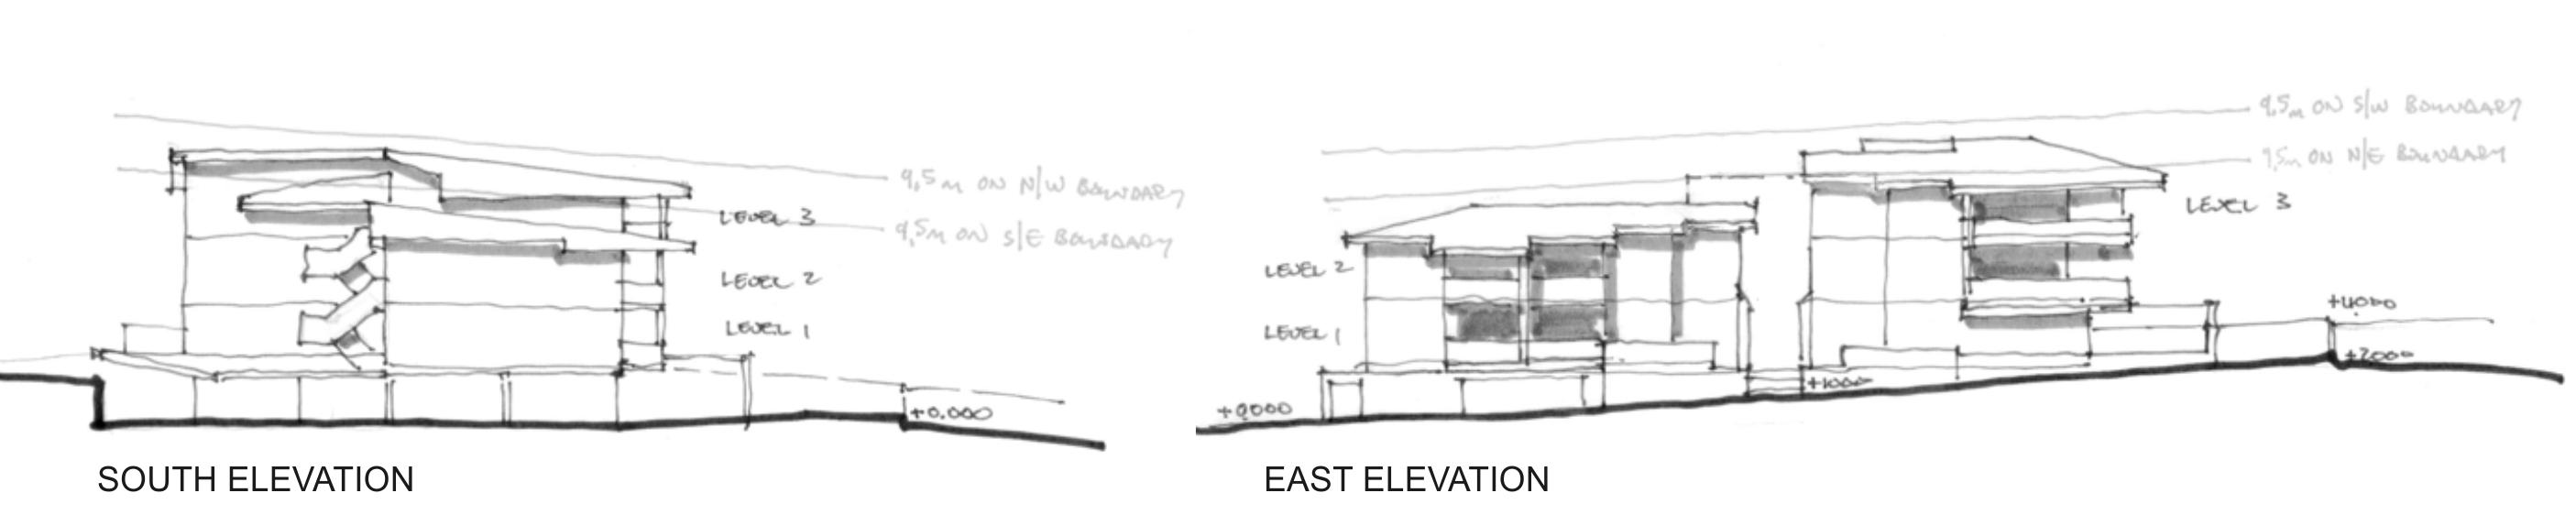 DHPW - Concept Elevations 2015